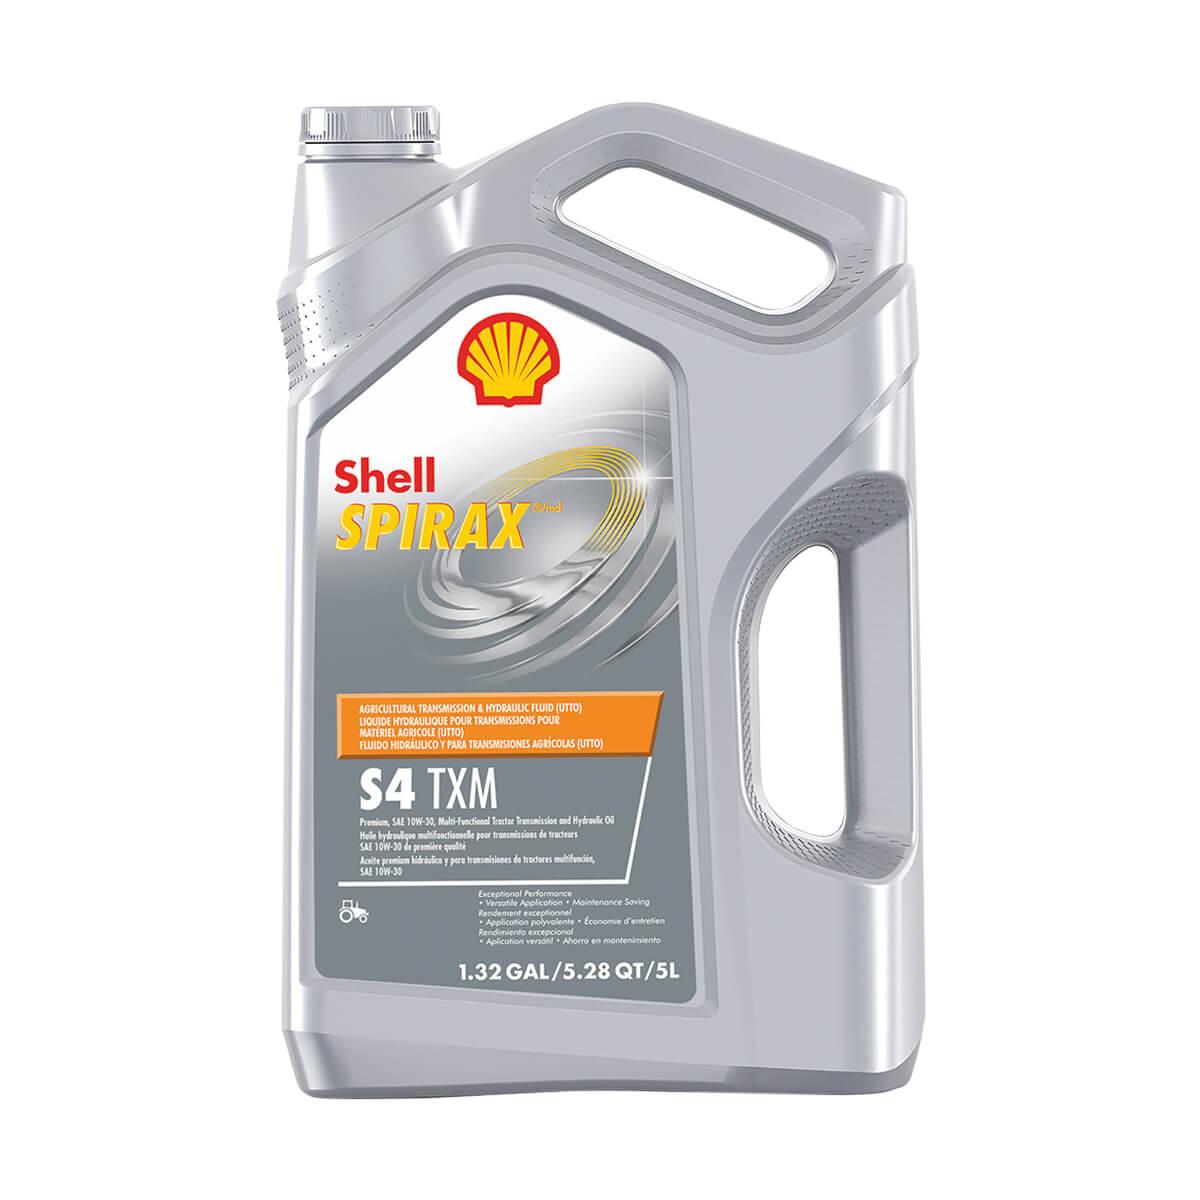 Shell Spirax S4 TXM - 5 L